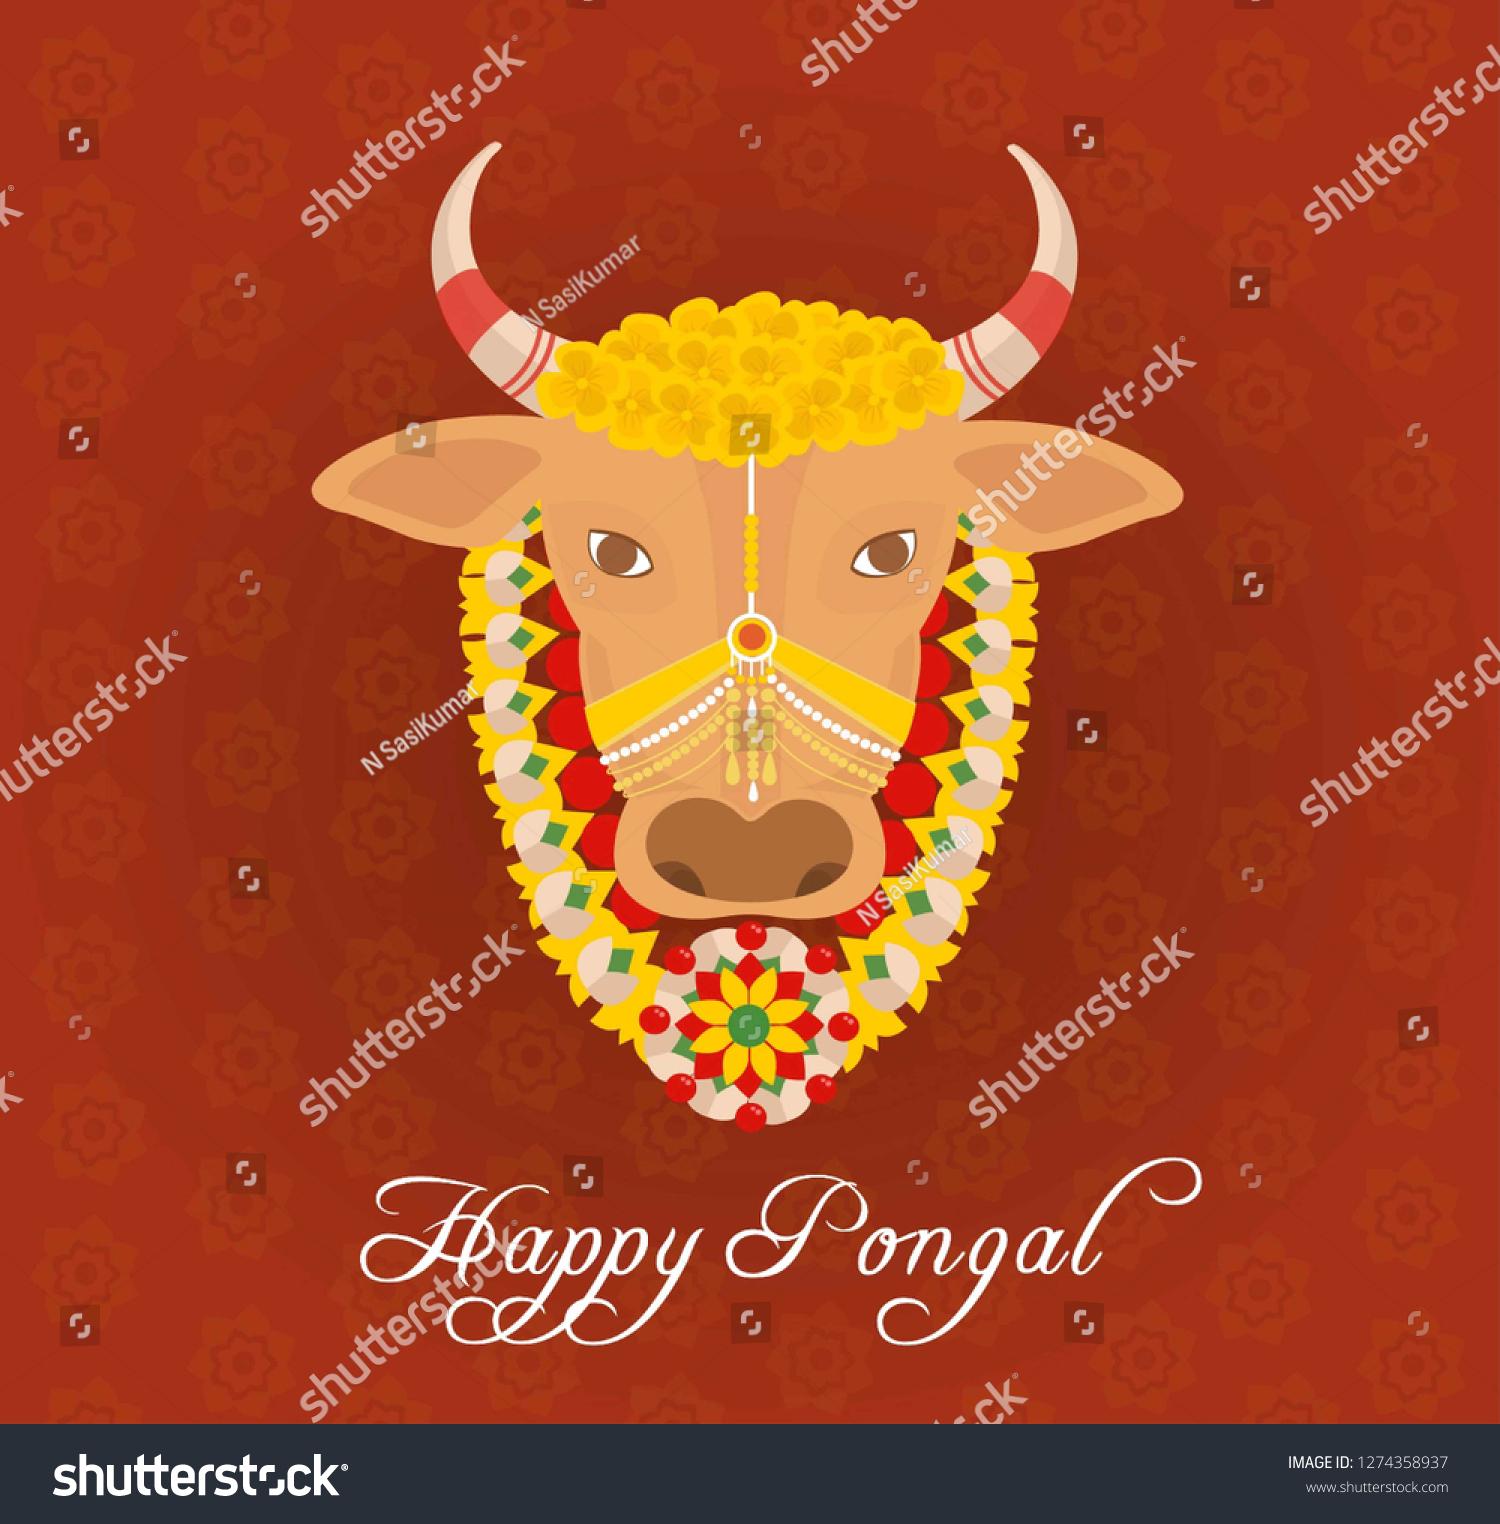 Happy pongal 2019 card with designed jallikattu cow background